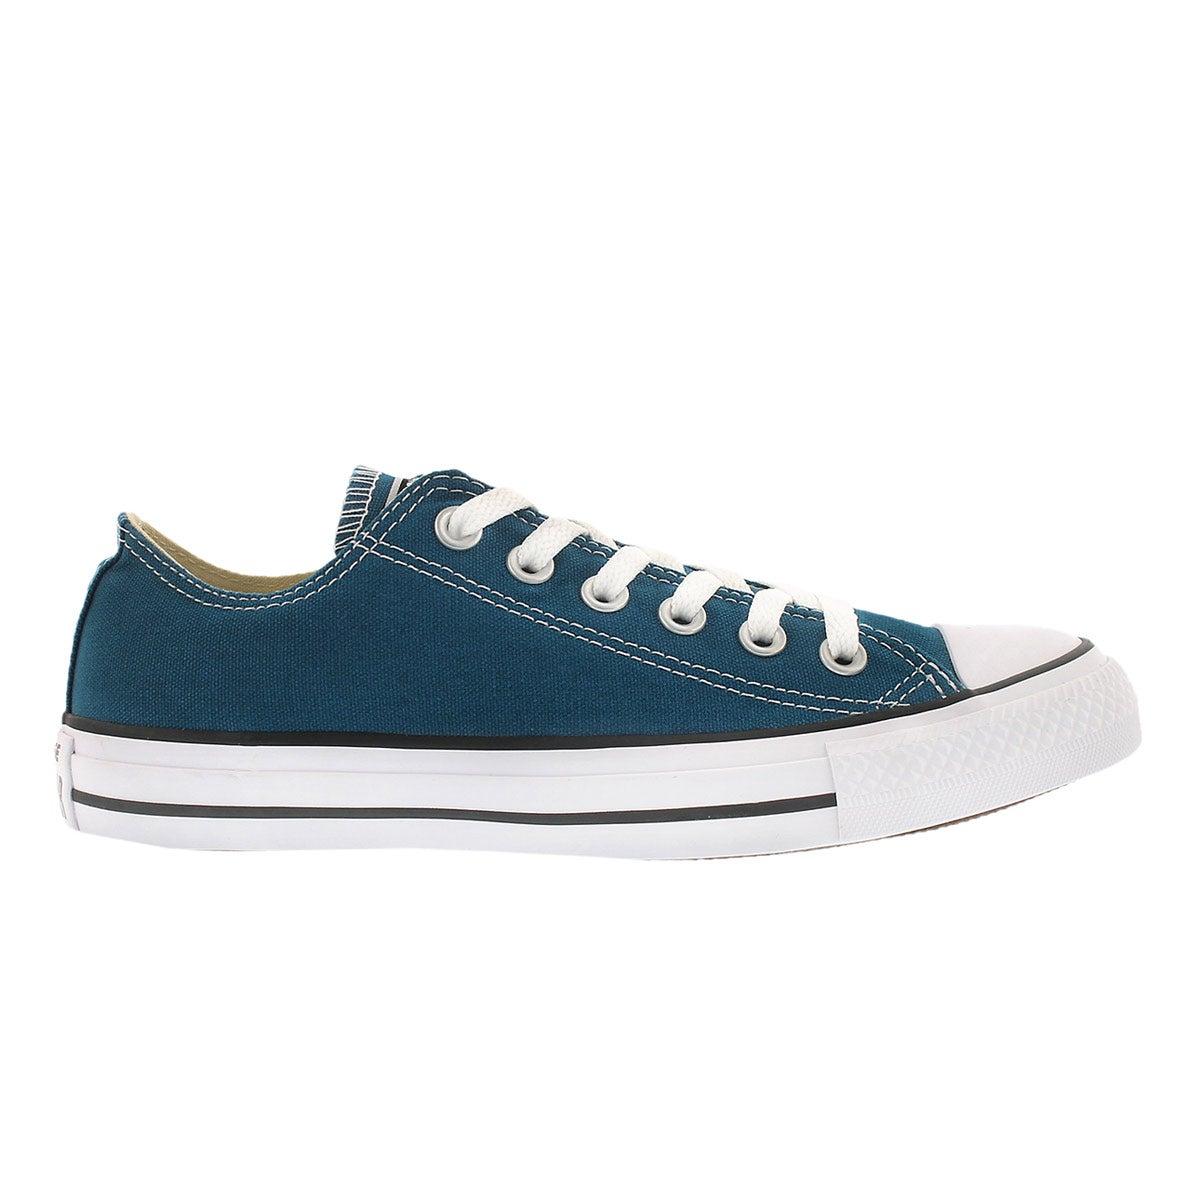 Lds CT A/S Seasonal blue lagoon sneaker